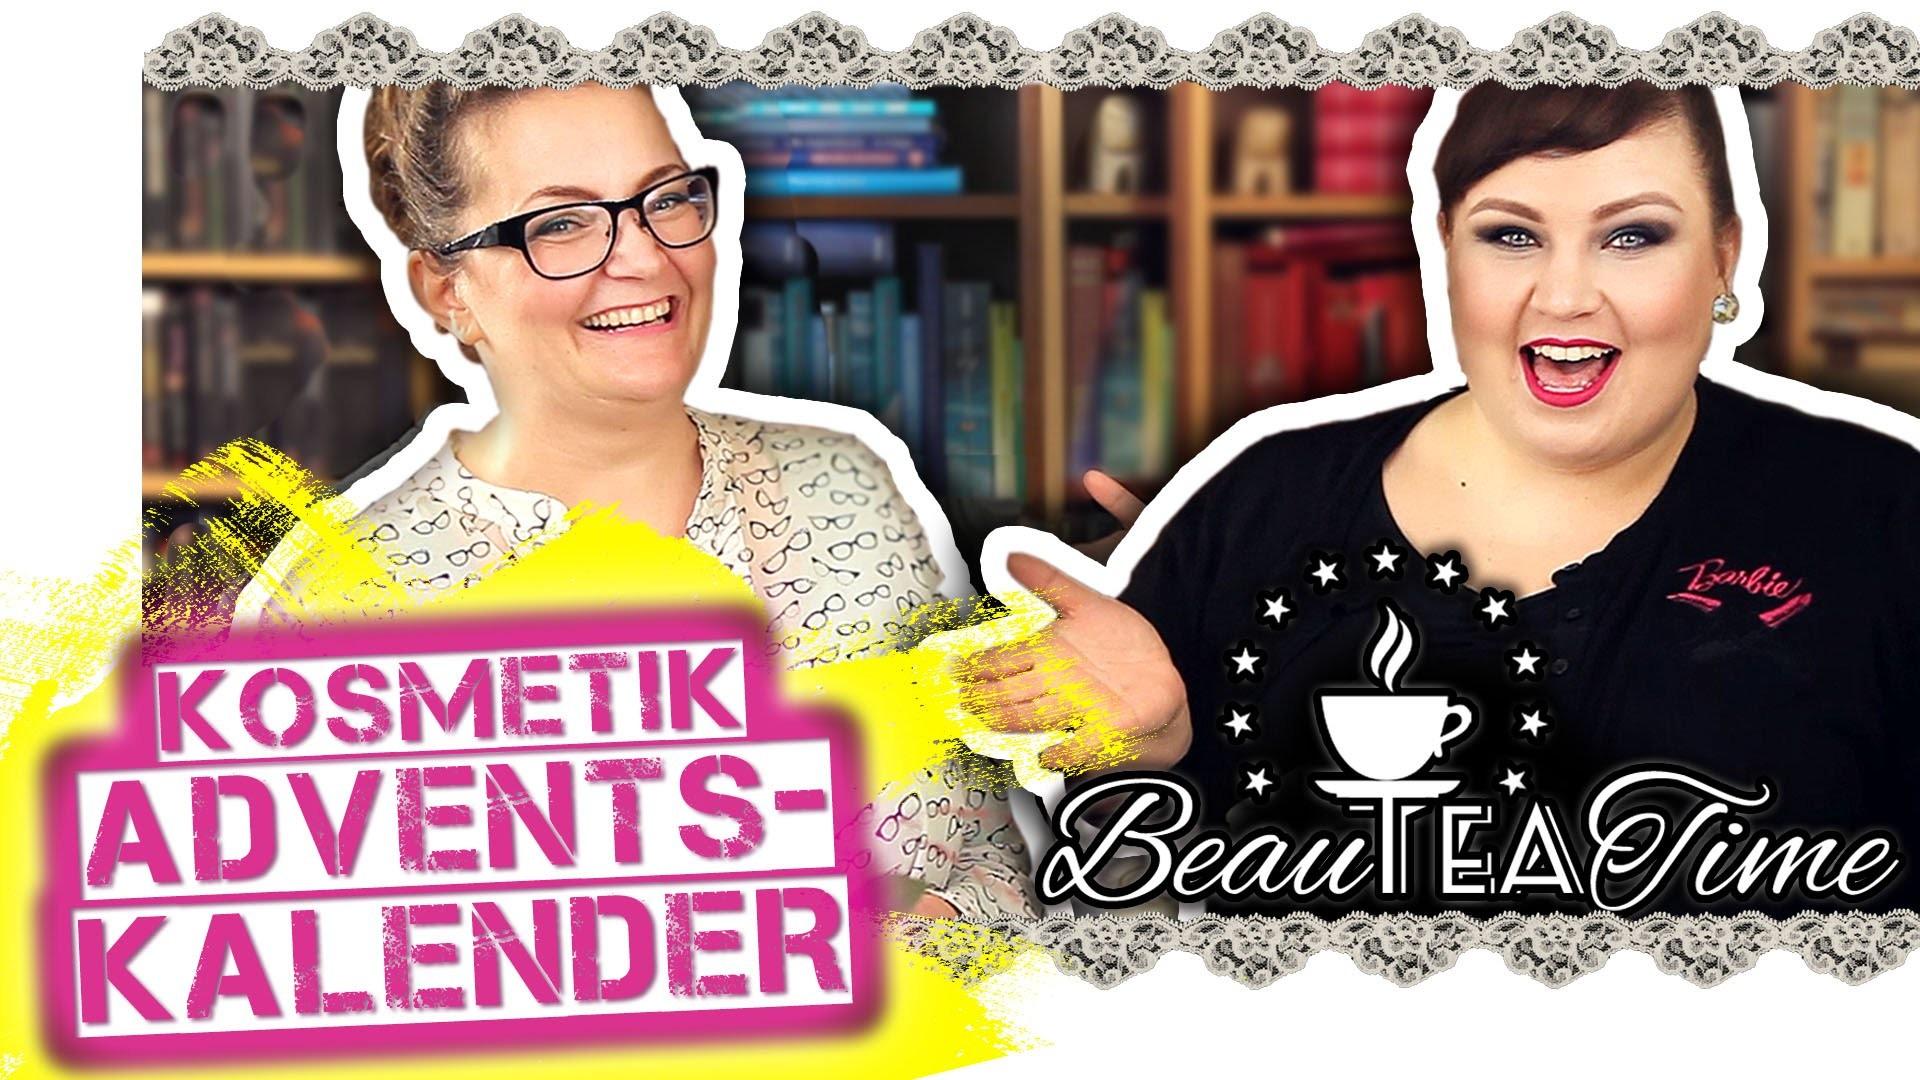 KOSMETIK ADVENTSKALENDER SELBER MACHEN kleine Makeup Geschenke DIY | #BeauTeaTime Folge 18